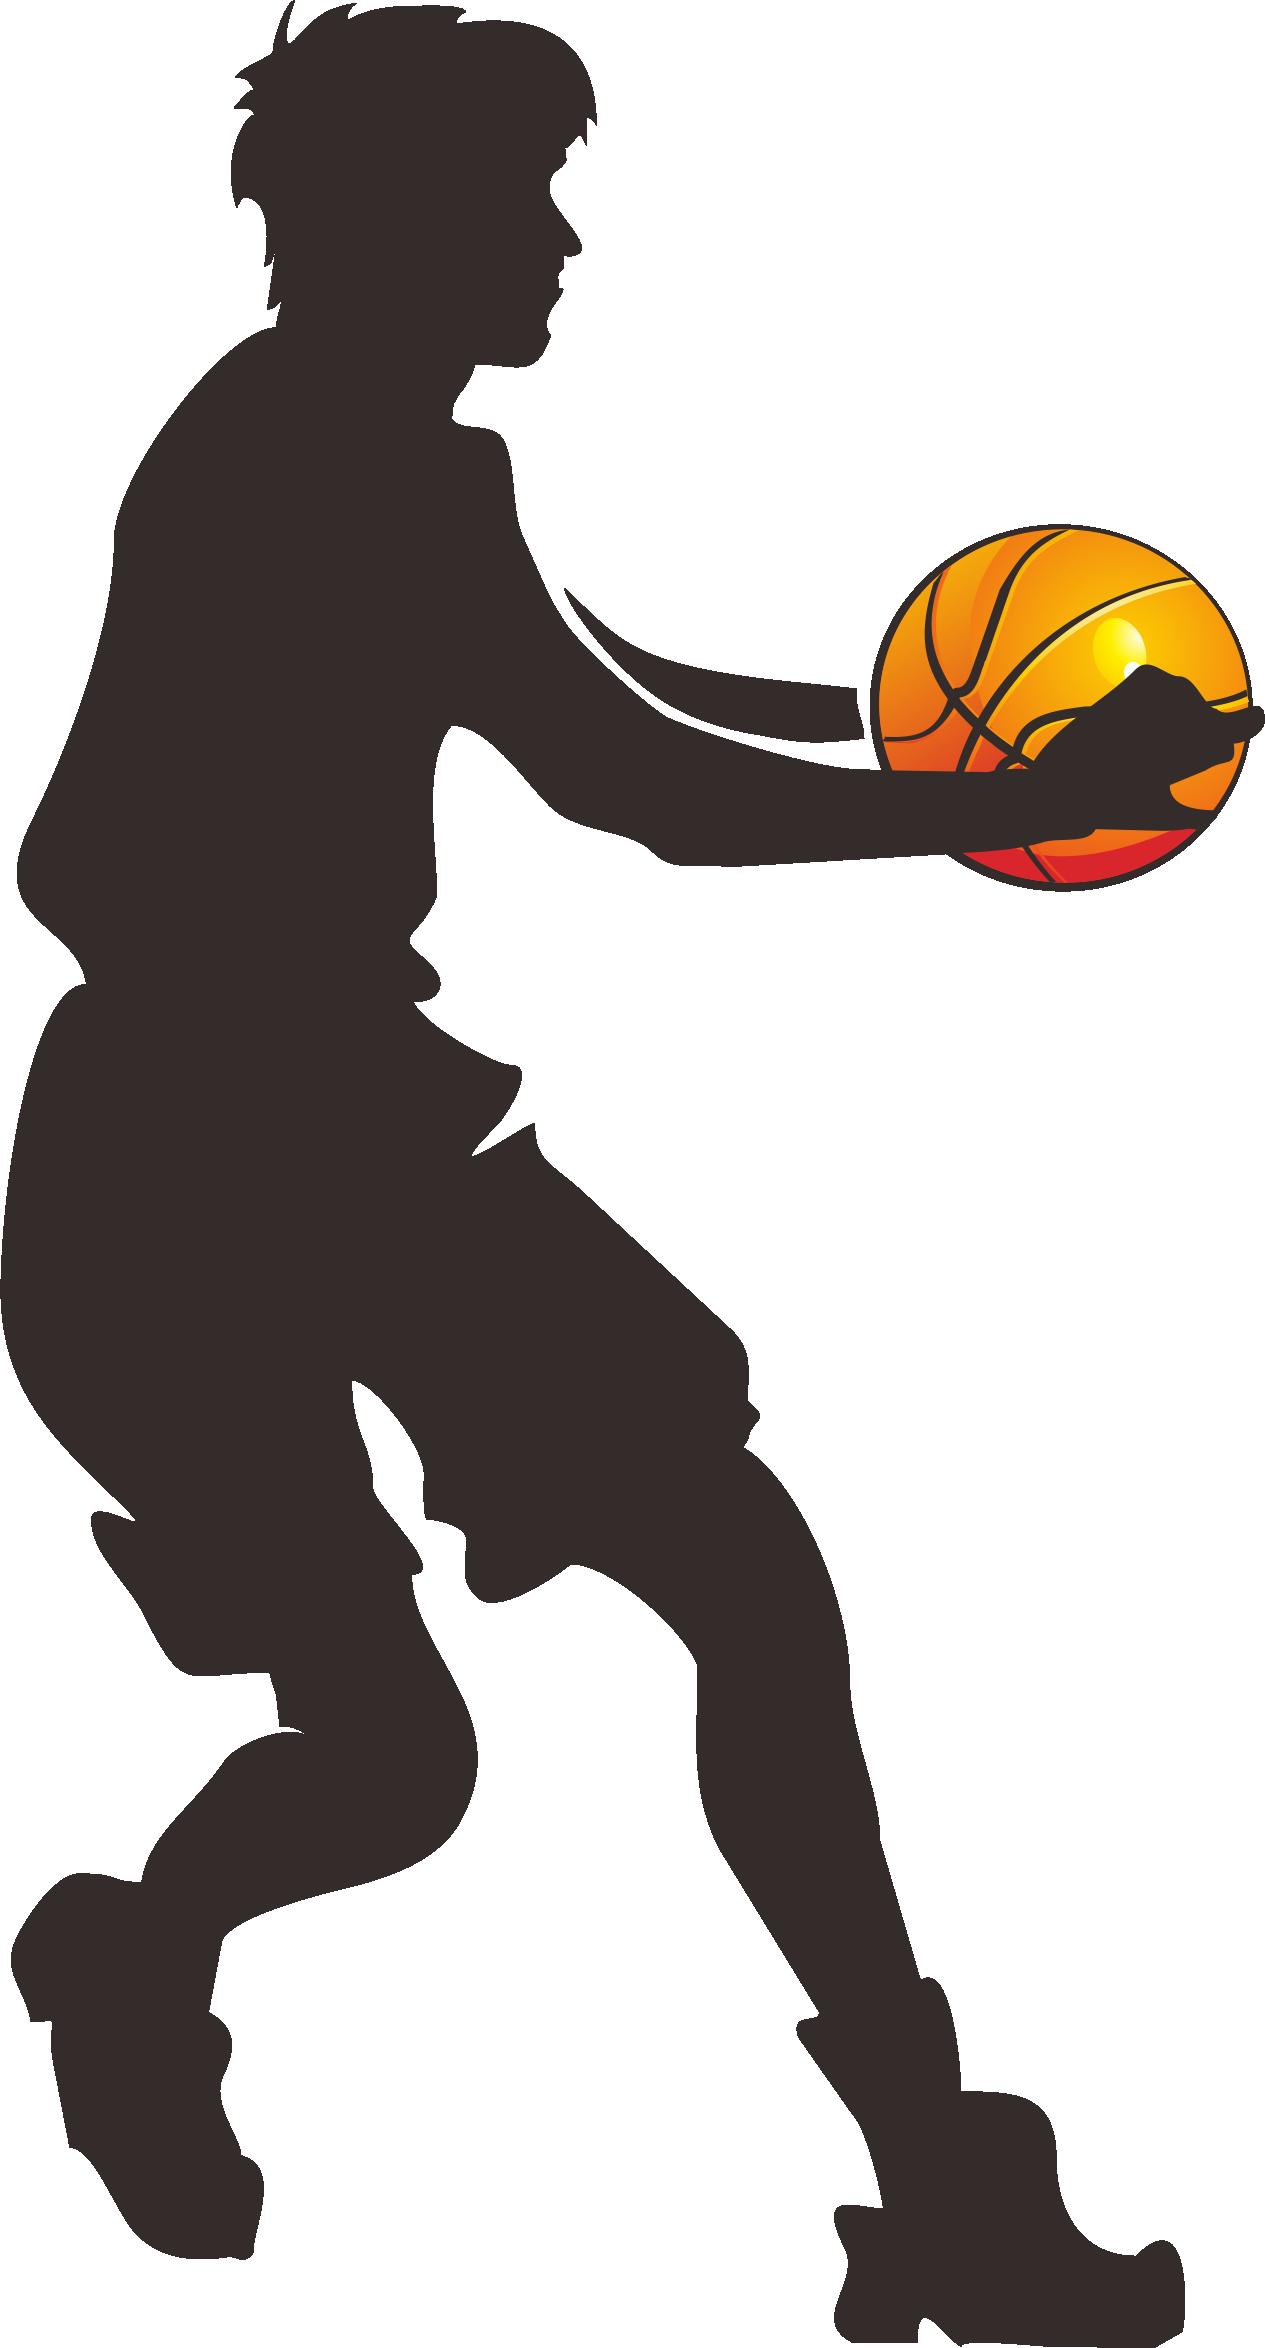 Basketball dunking clipart banner free stock Basketball Backboard Slam dunk Clip art - basketball 1265*2348 ... banner free stock